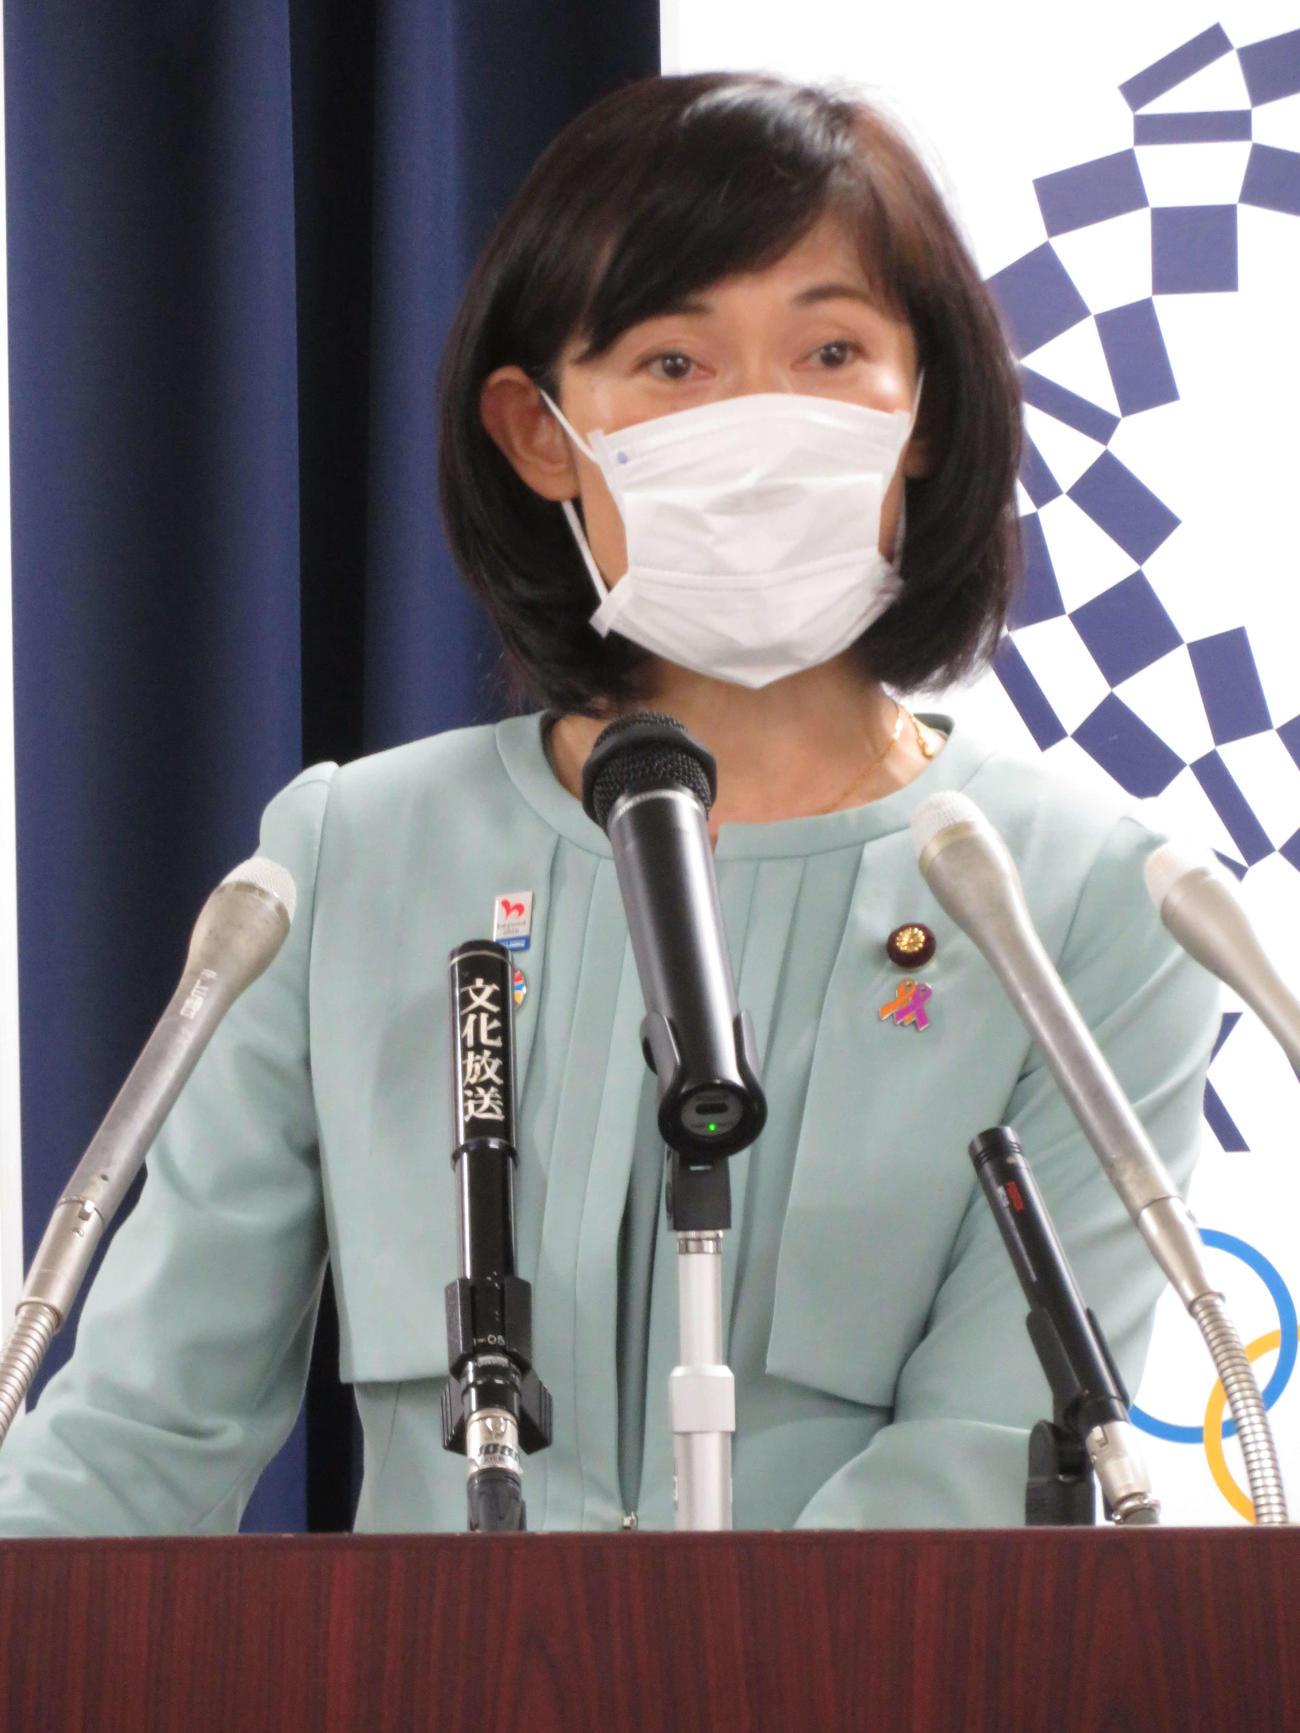 閣議後会見を行った丸川珠代五輪相(撮影・近藤由美子)